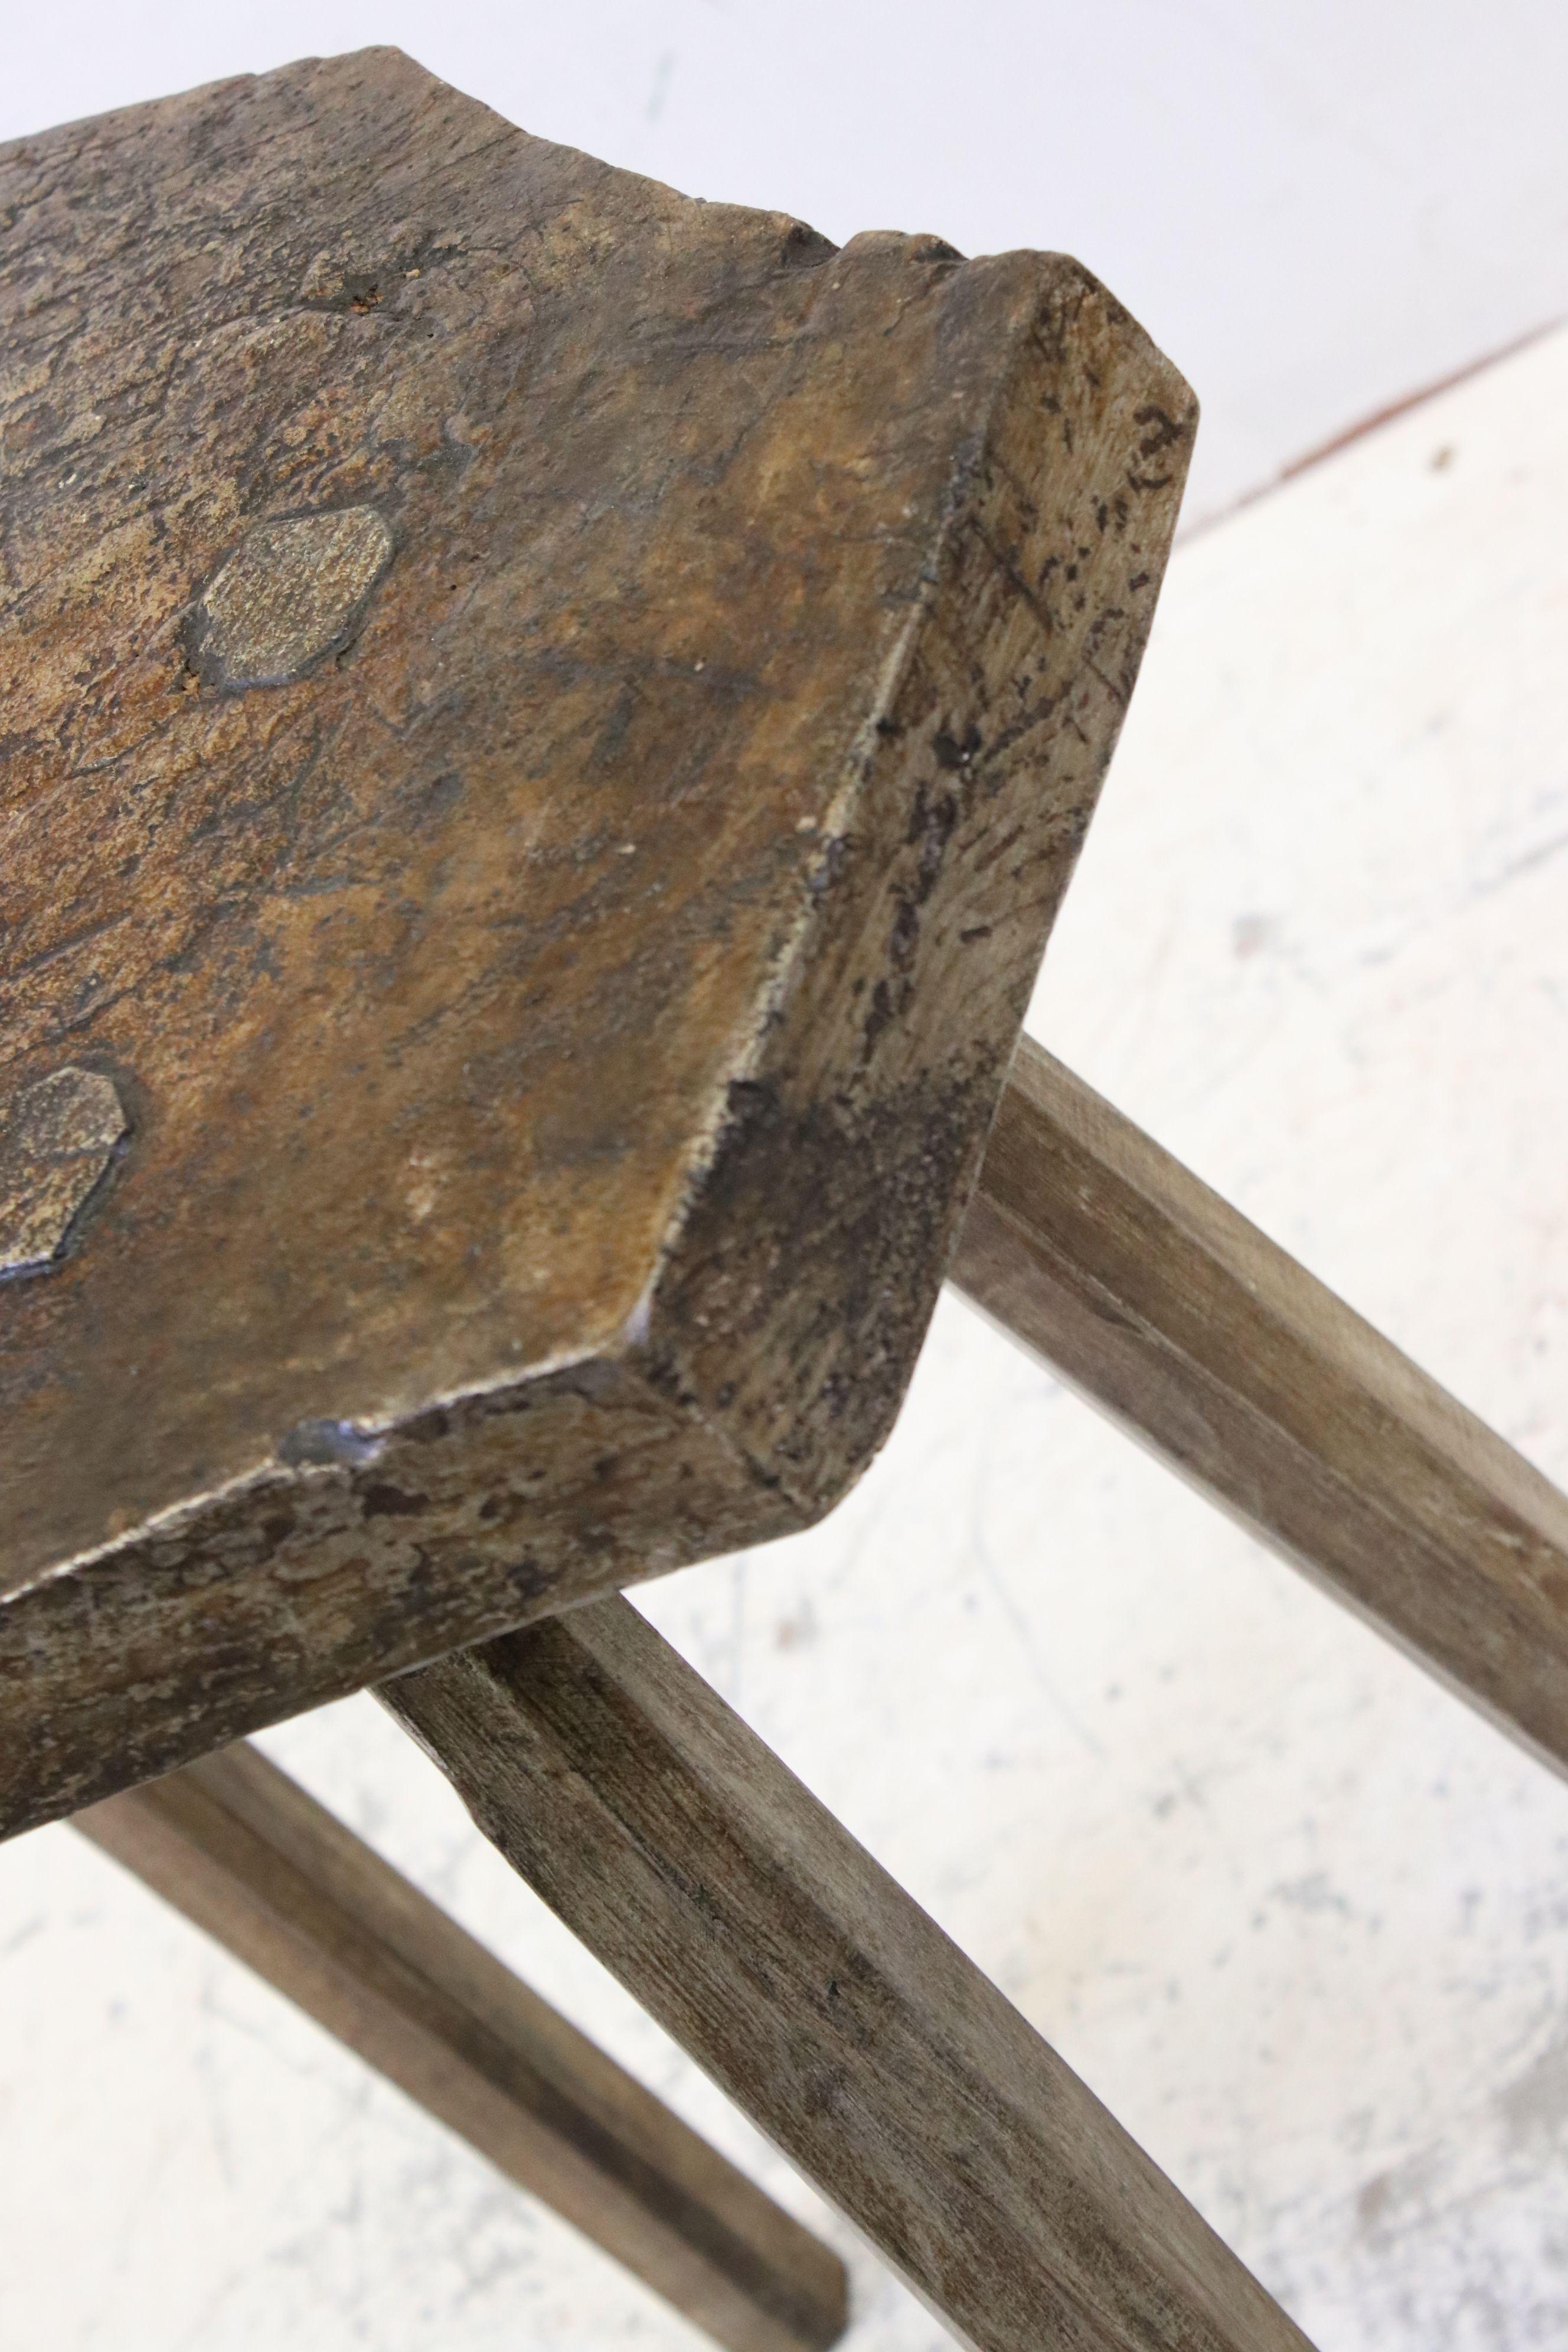 Antique elm rustic preparation table - Image 3 of 3